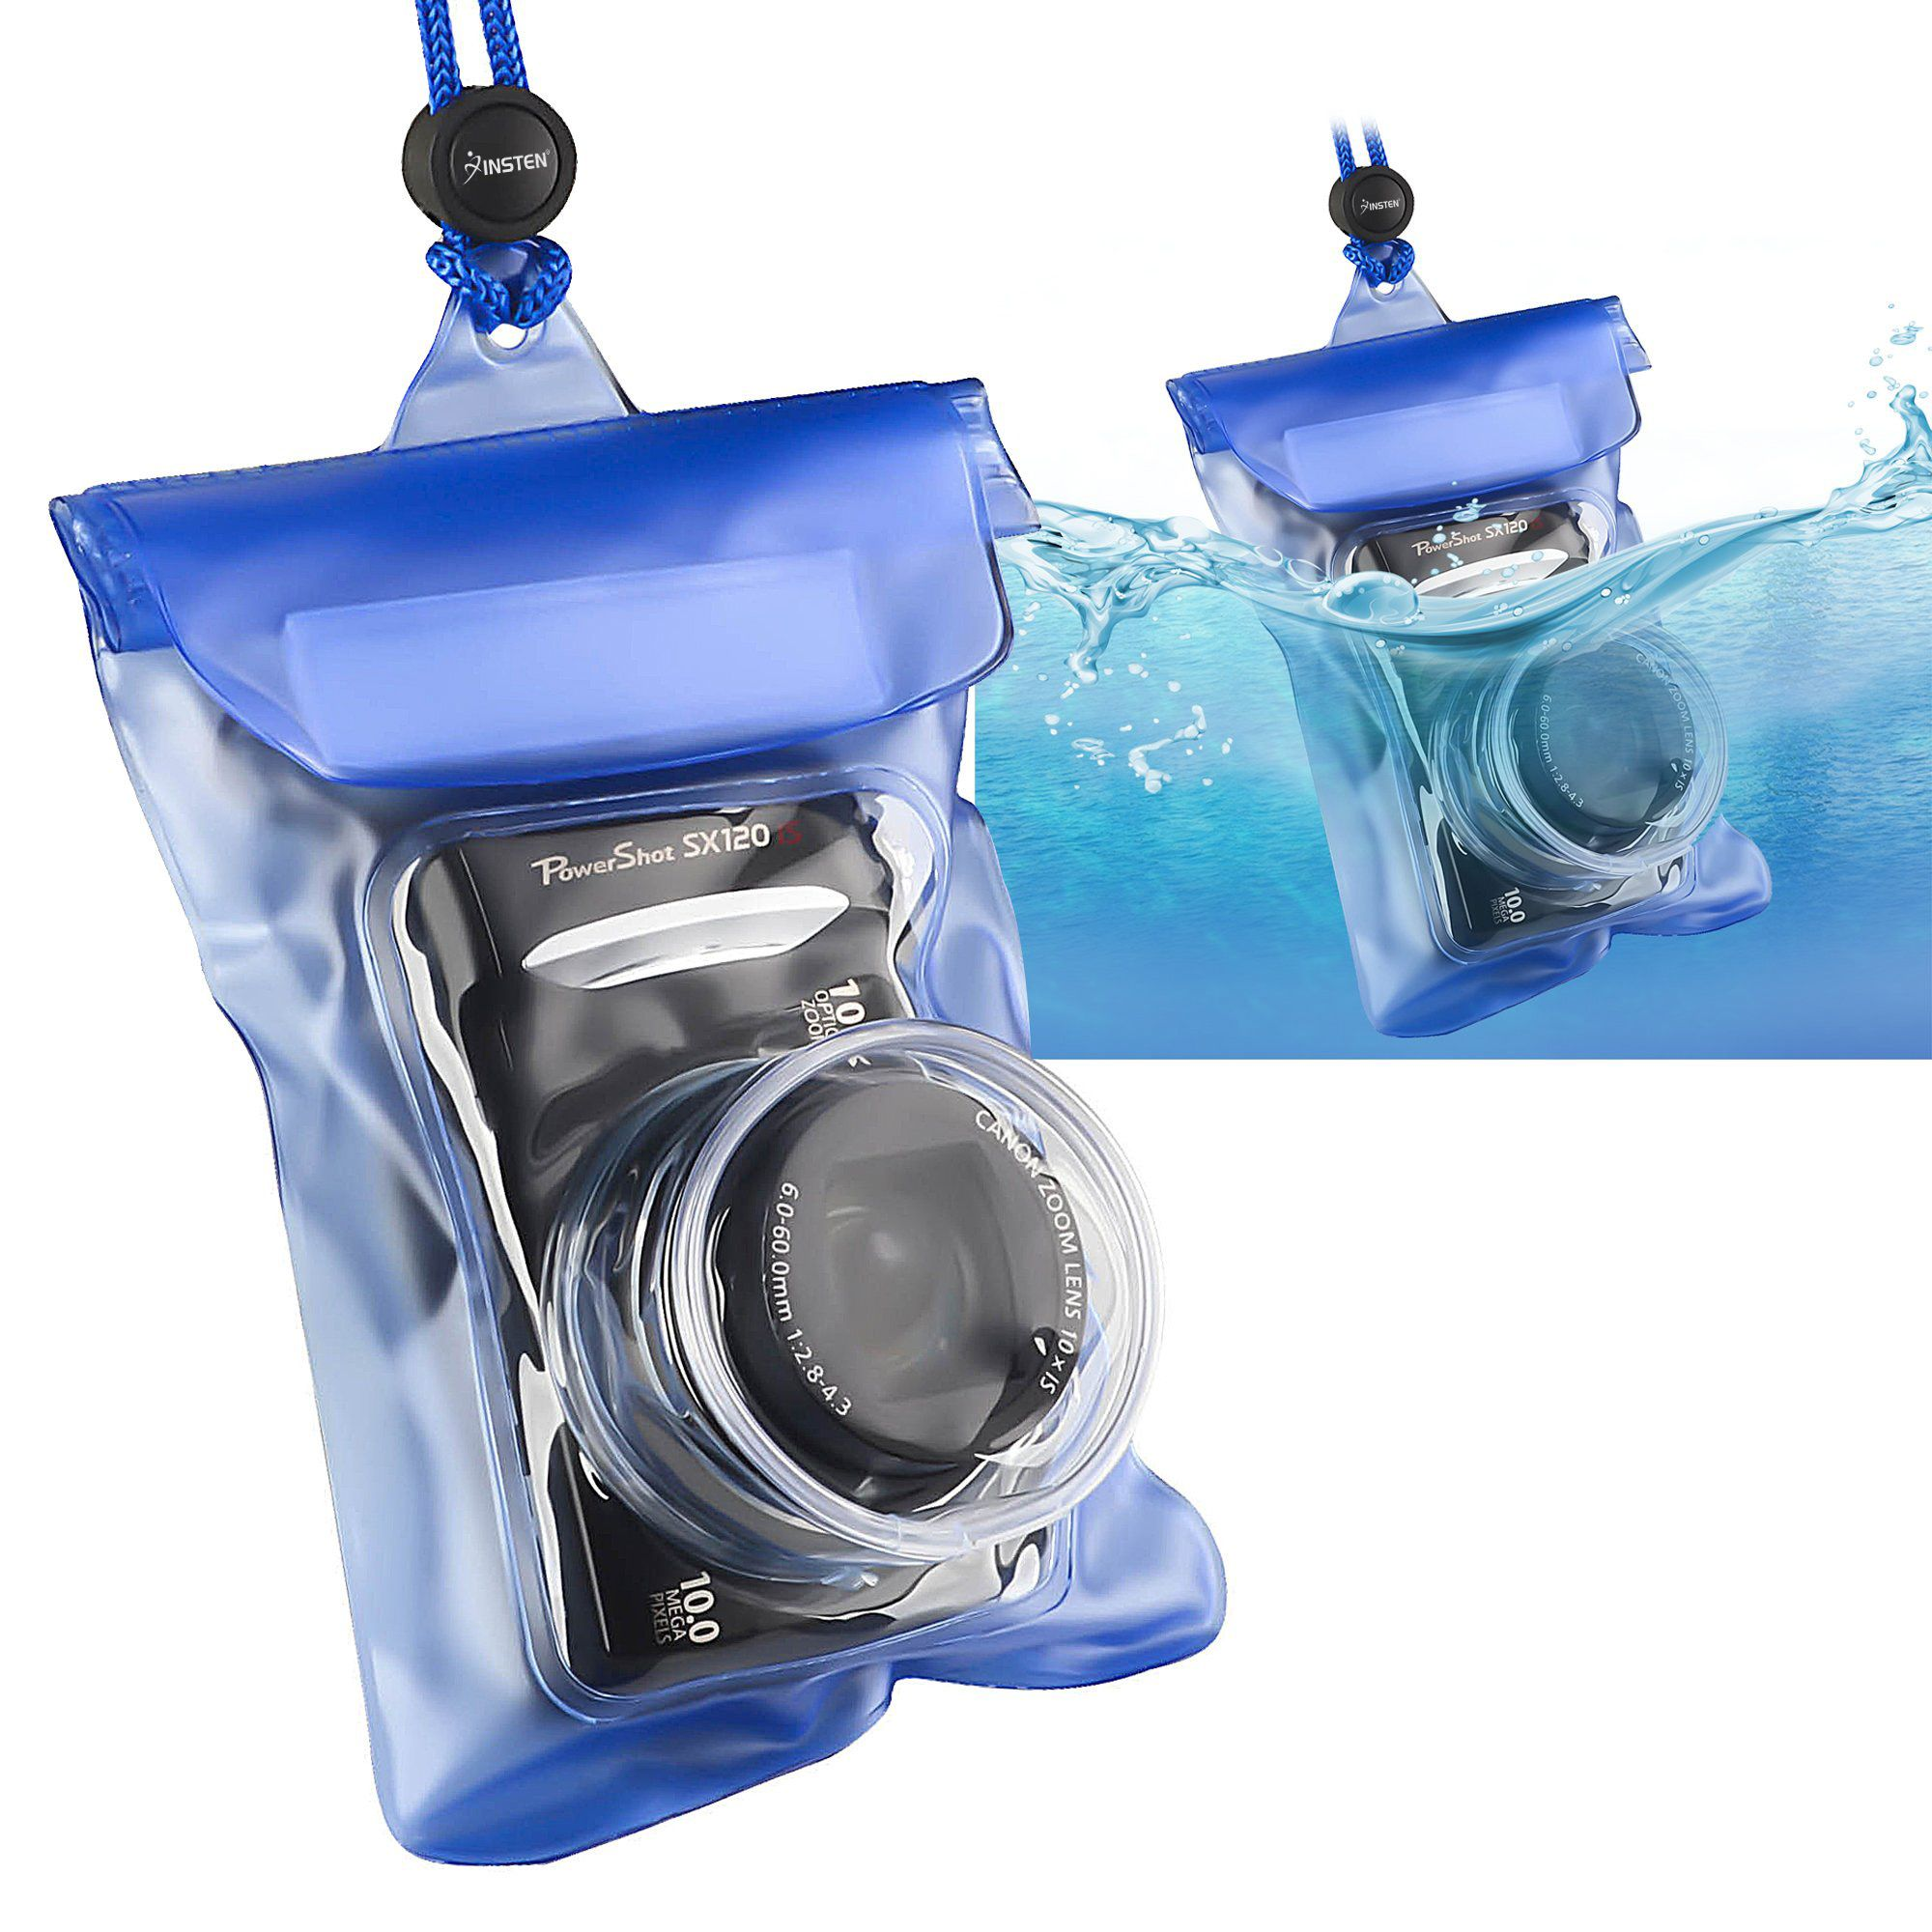 Insten Waterproof Camera Case Bag with Rope , Blue